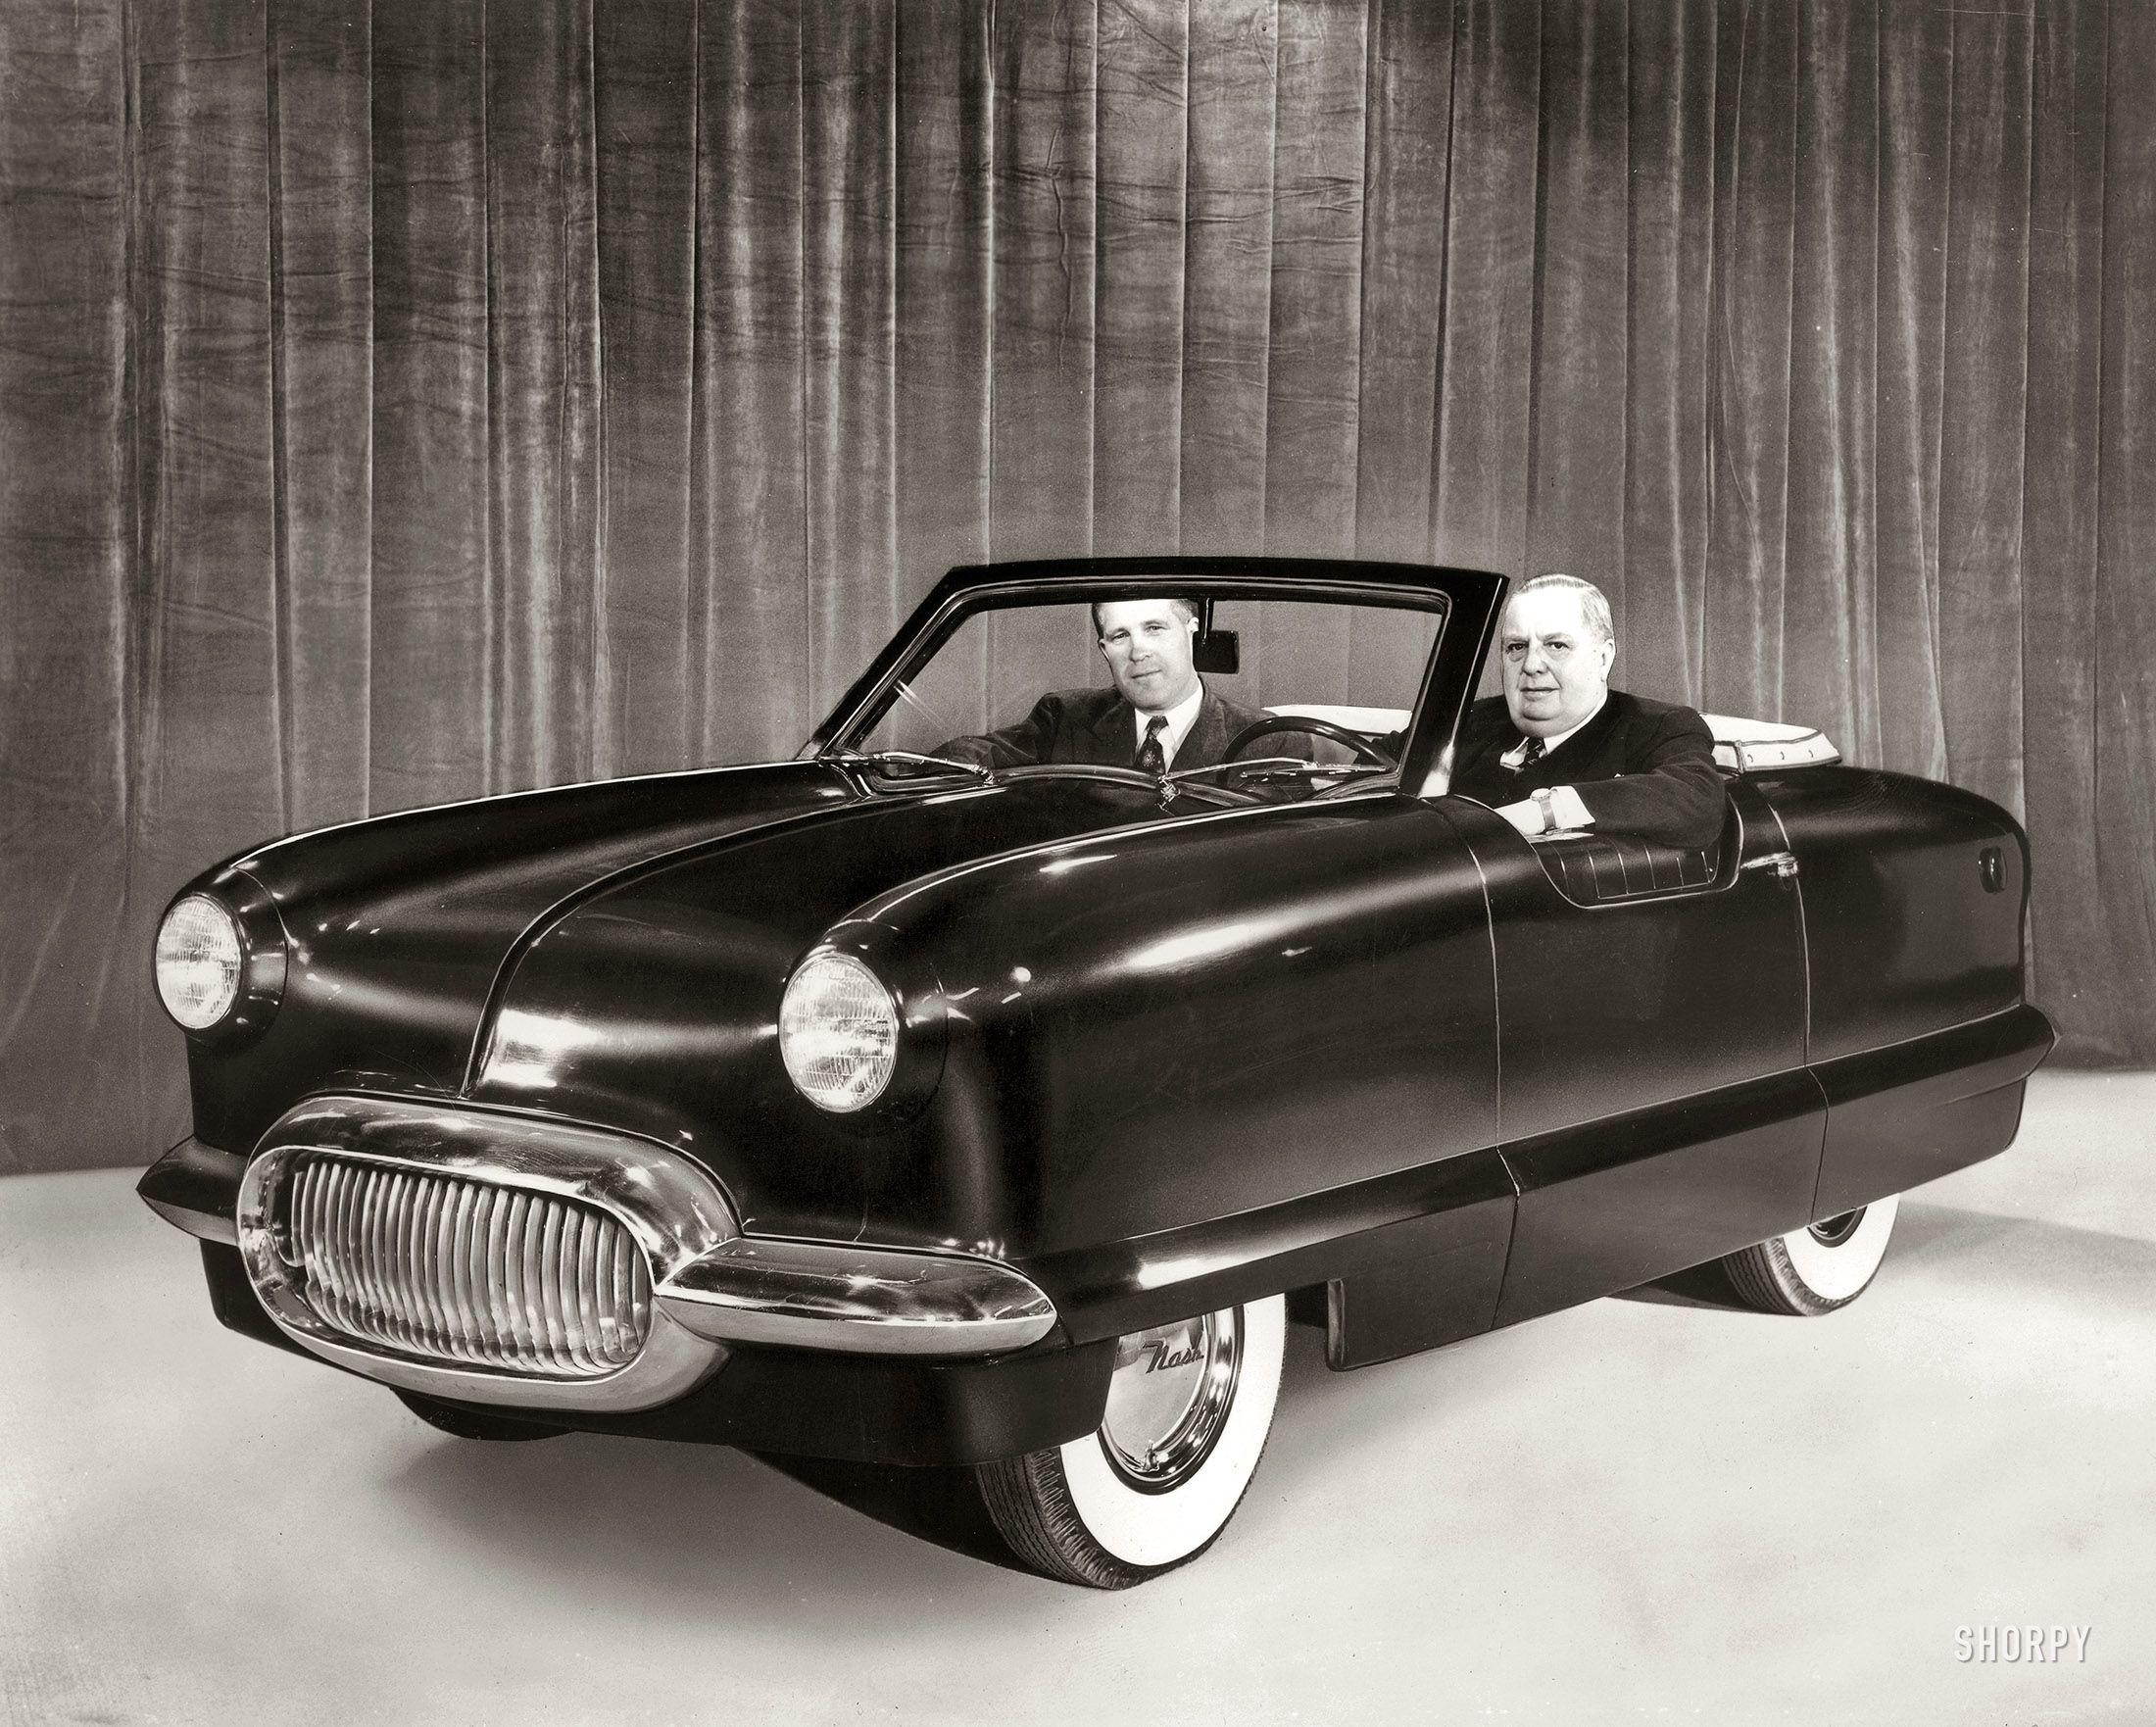 1950 Nash experimental NXI.\